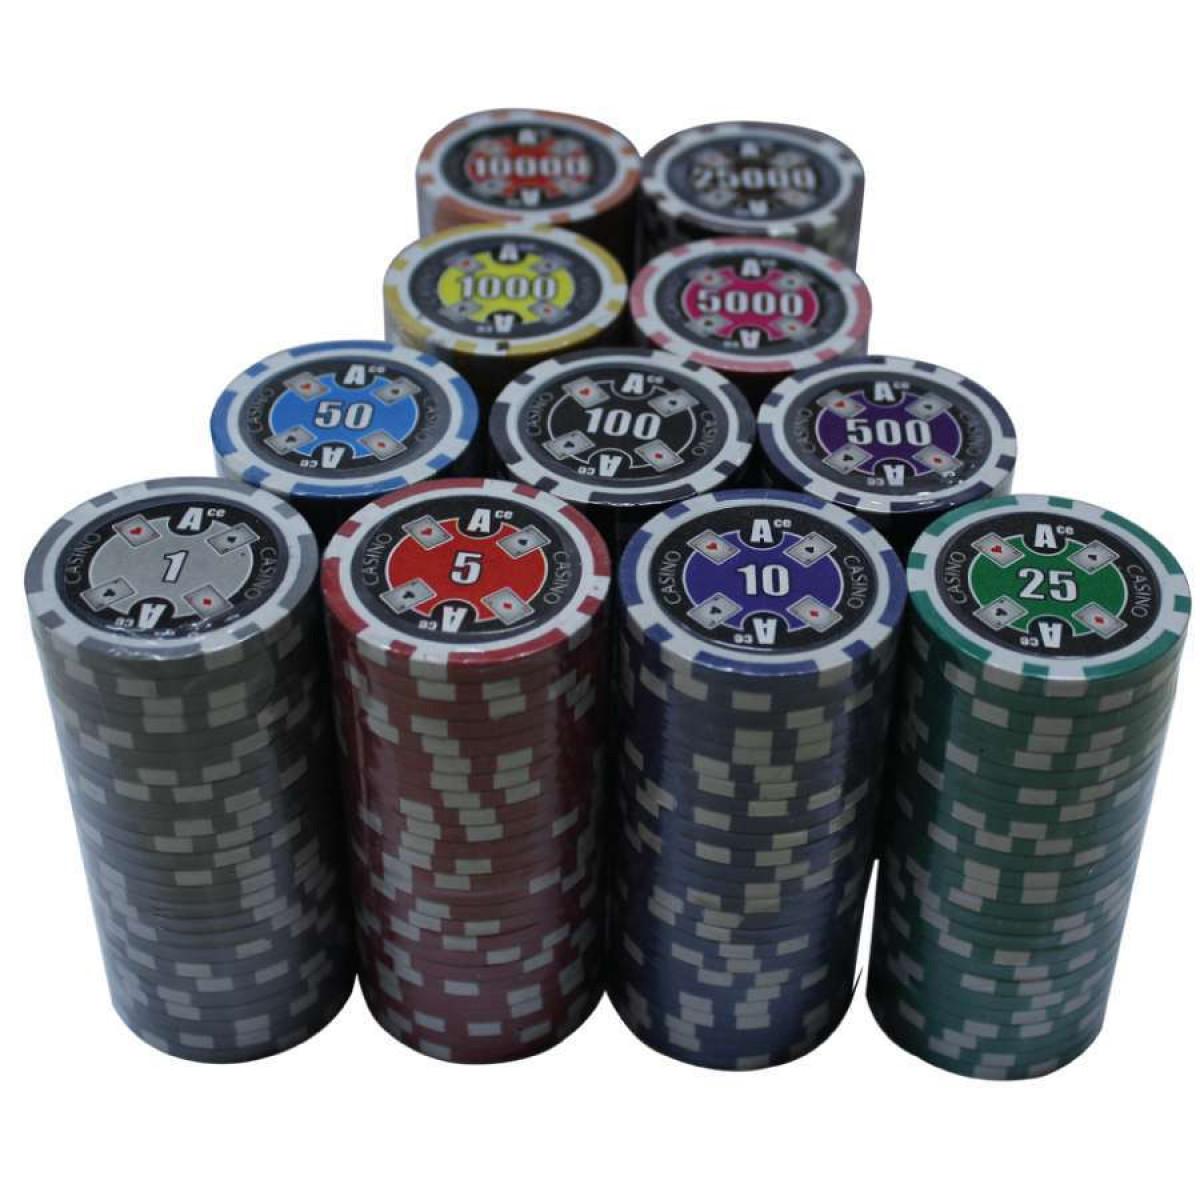 4 aces poker name